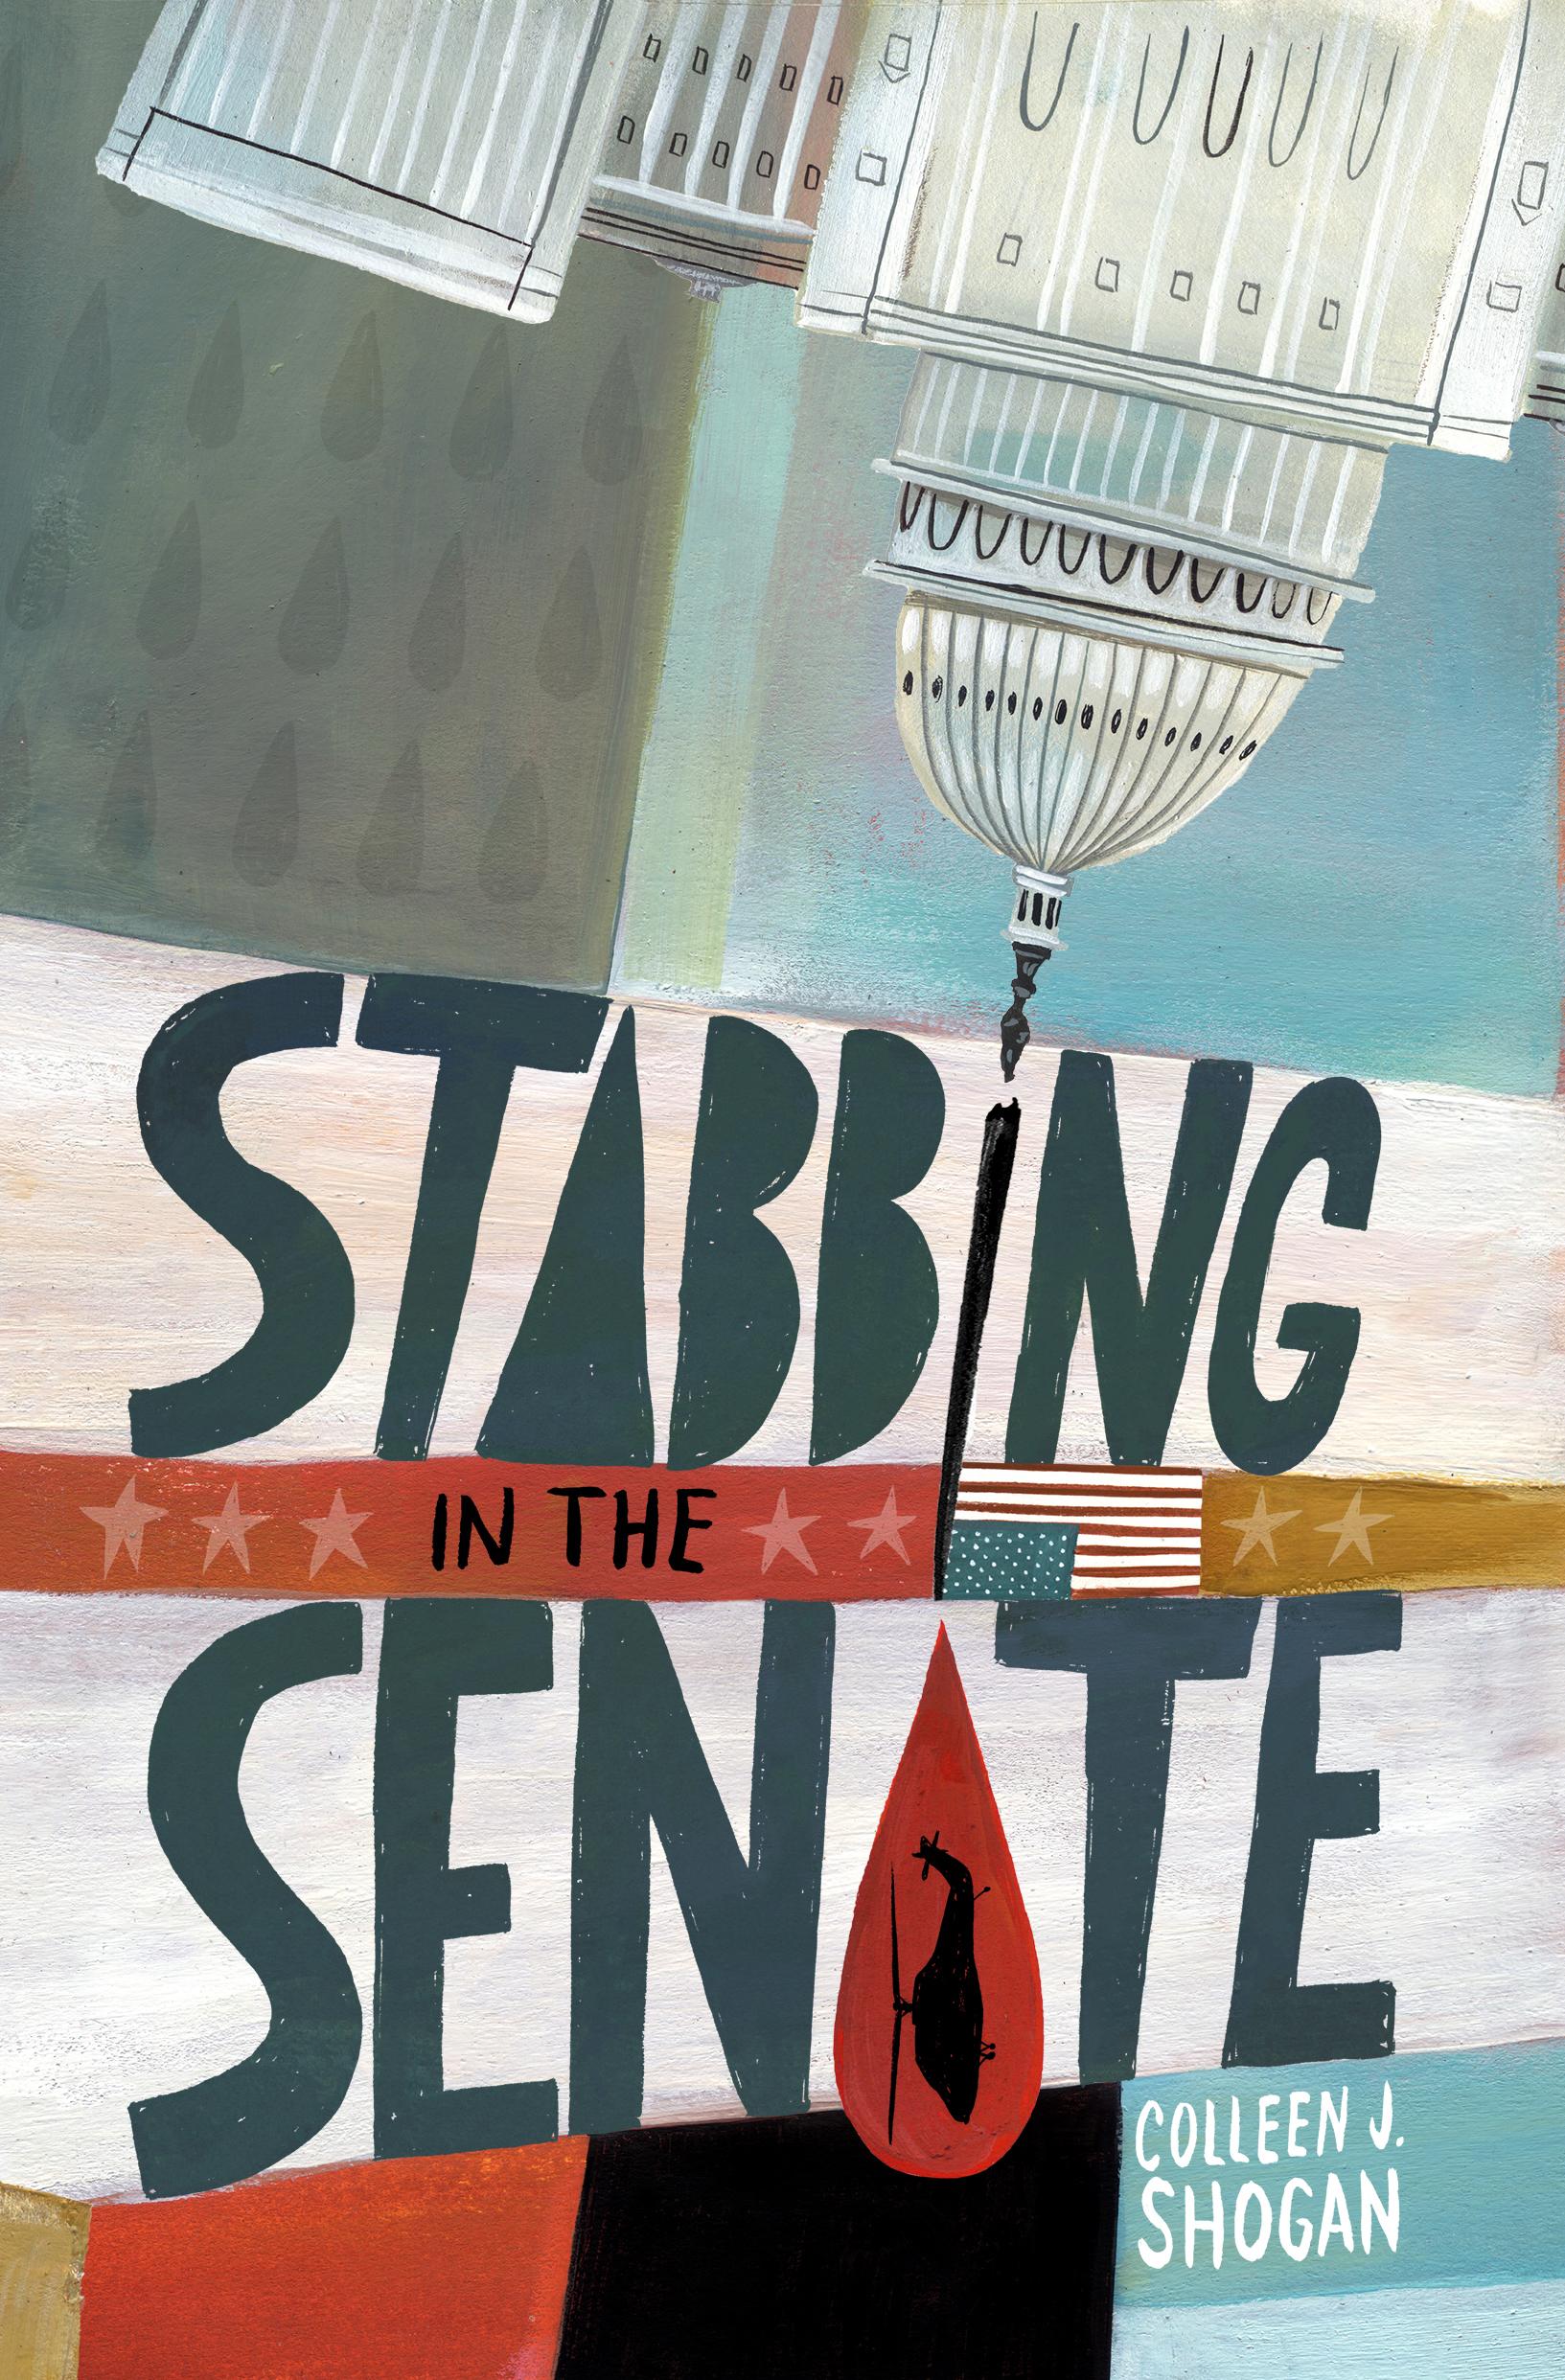 senate_front.jpg